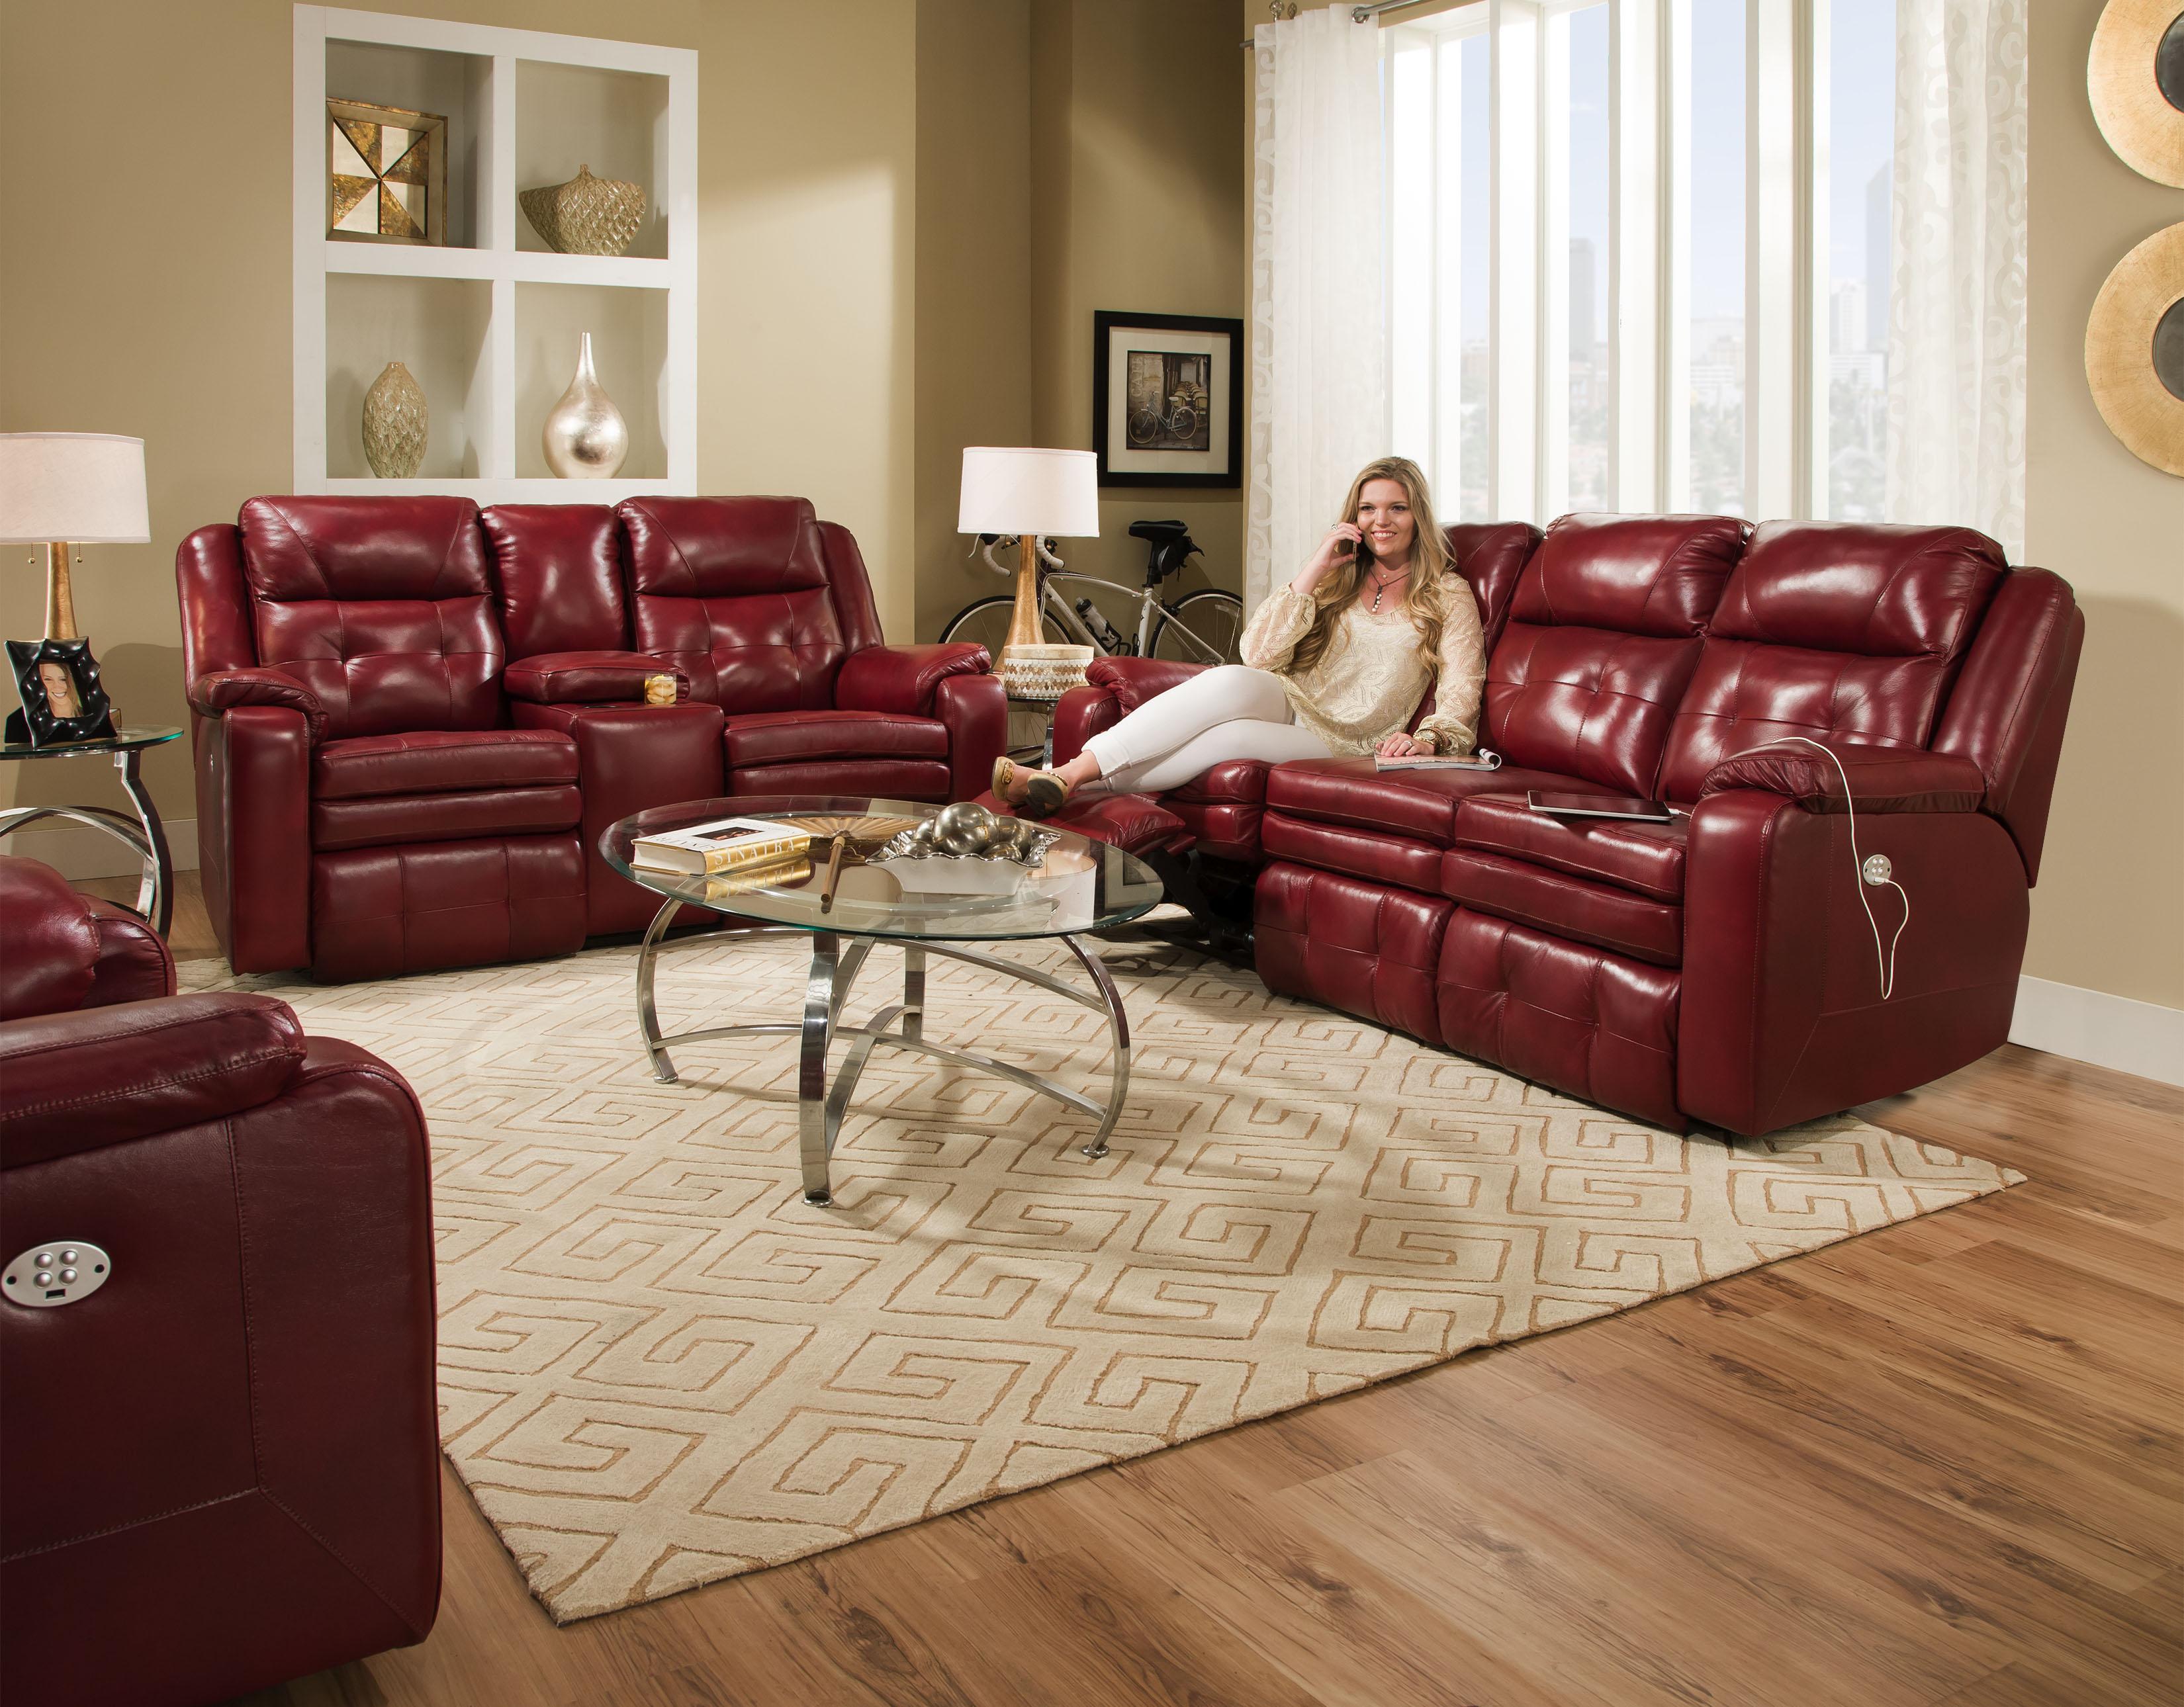 850 Inspire Sofa Image